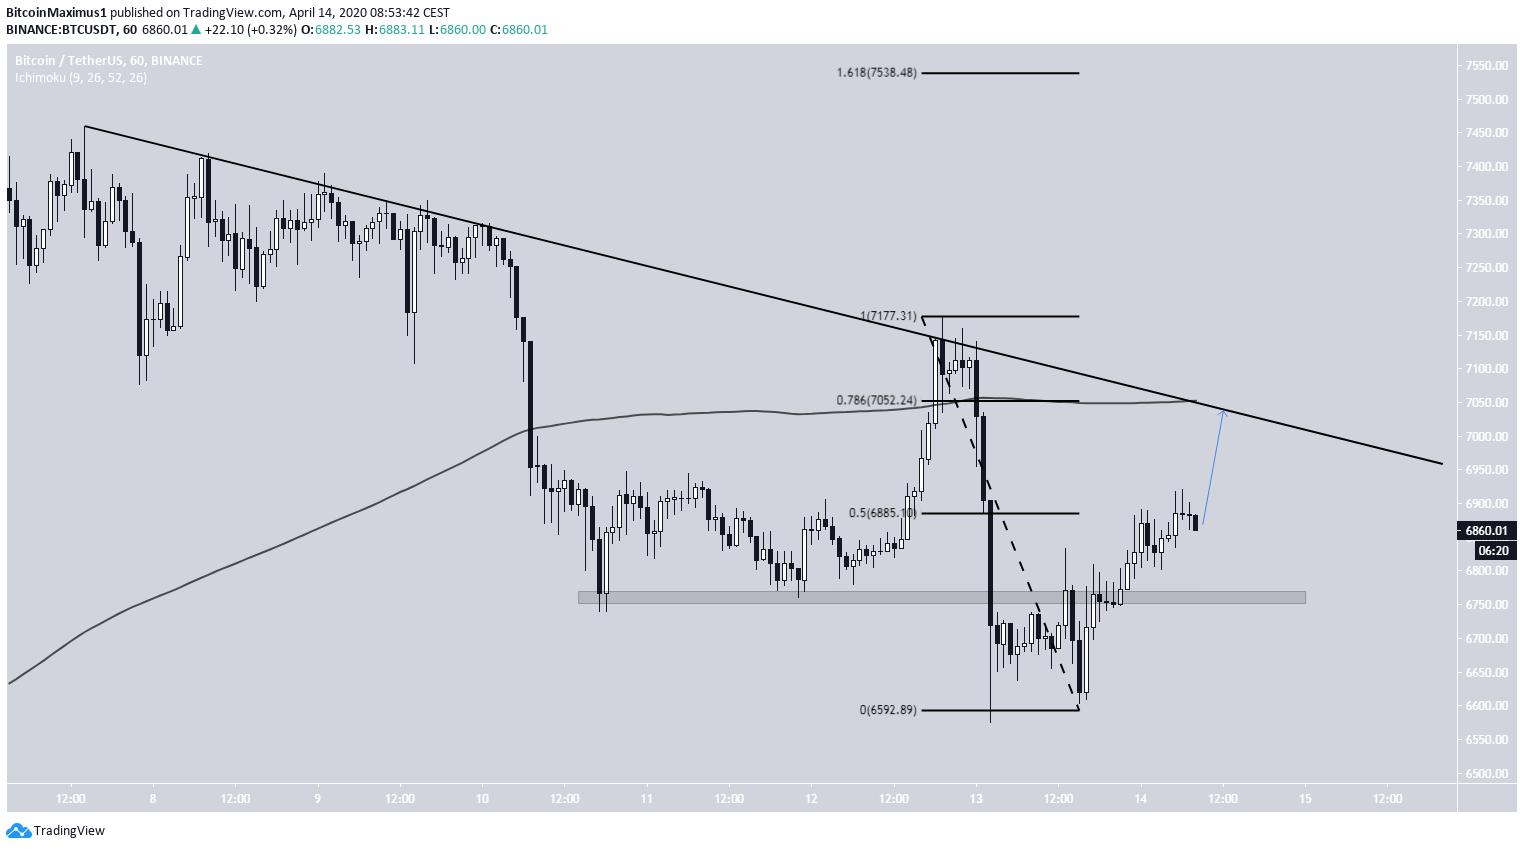 Bitcoin Descending Resistance Line